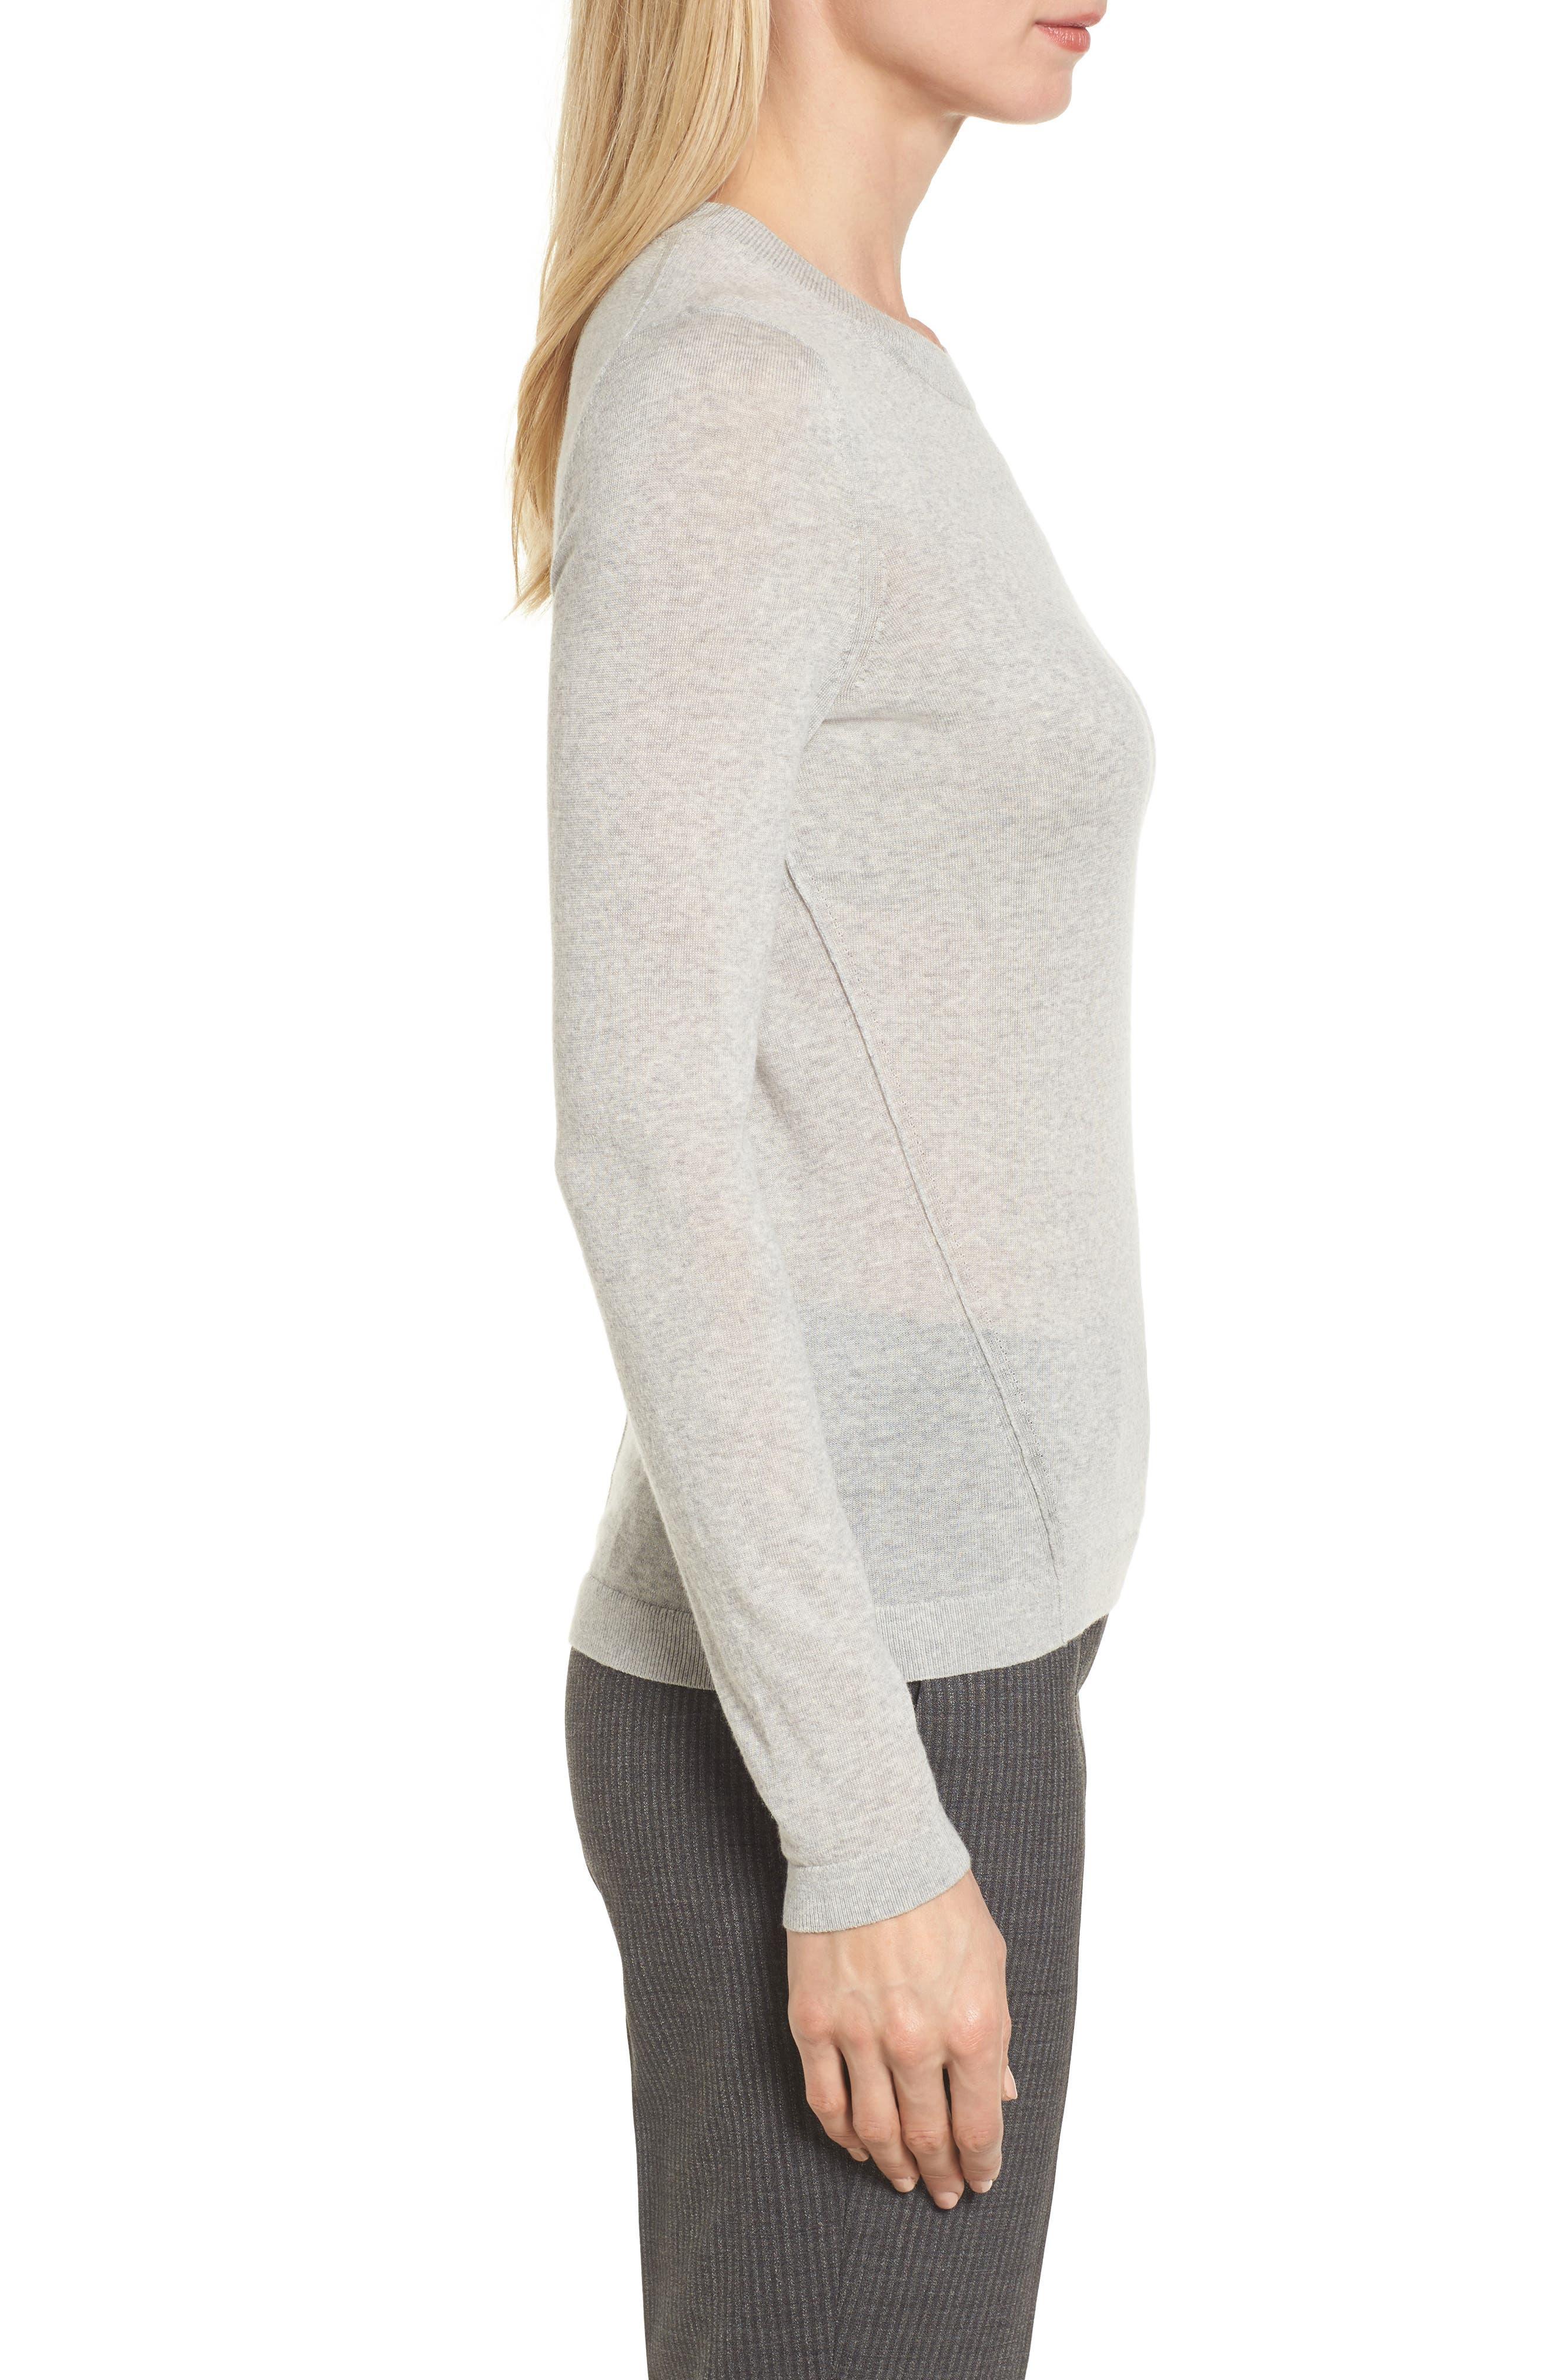 Fayme Wool Crewneck Sweater,                             Alternate thumbnail 3, color,                             Cozy Grey Melange